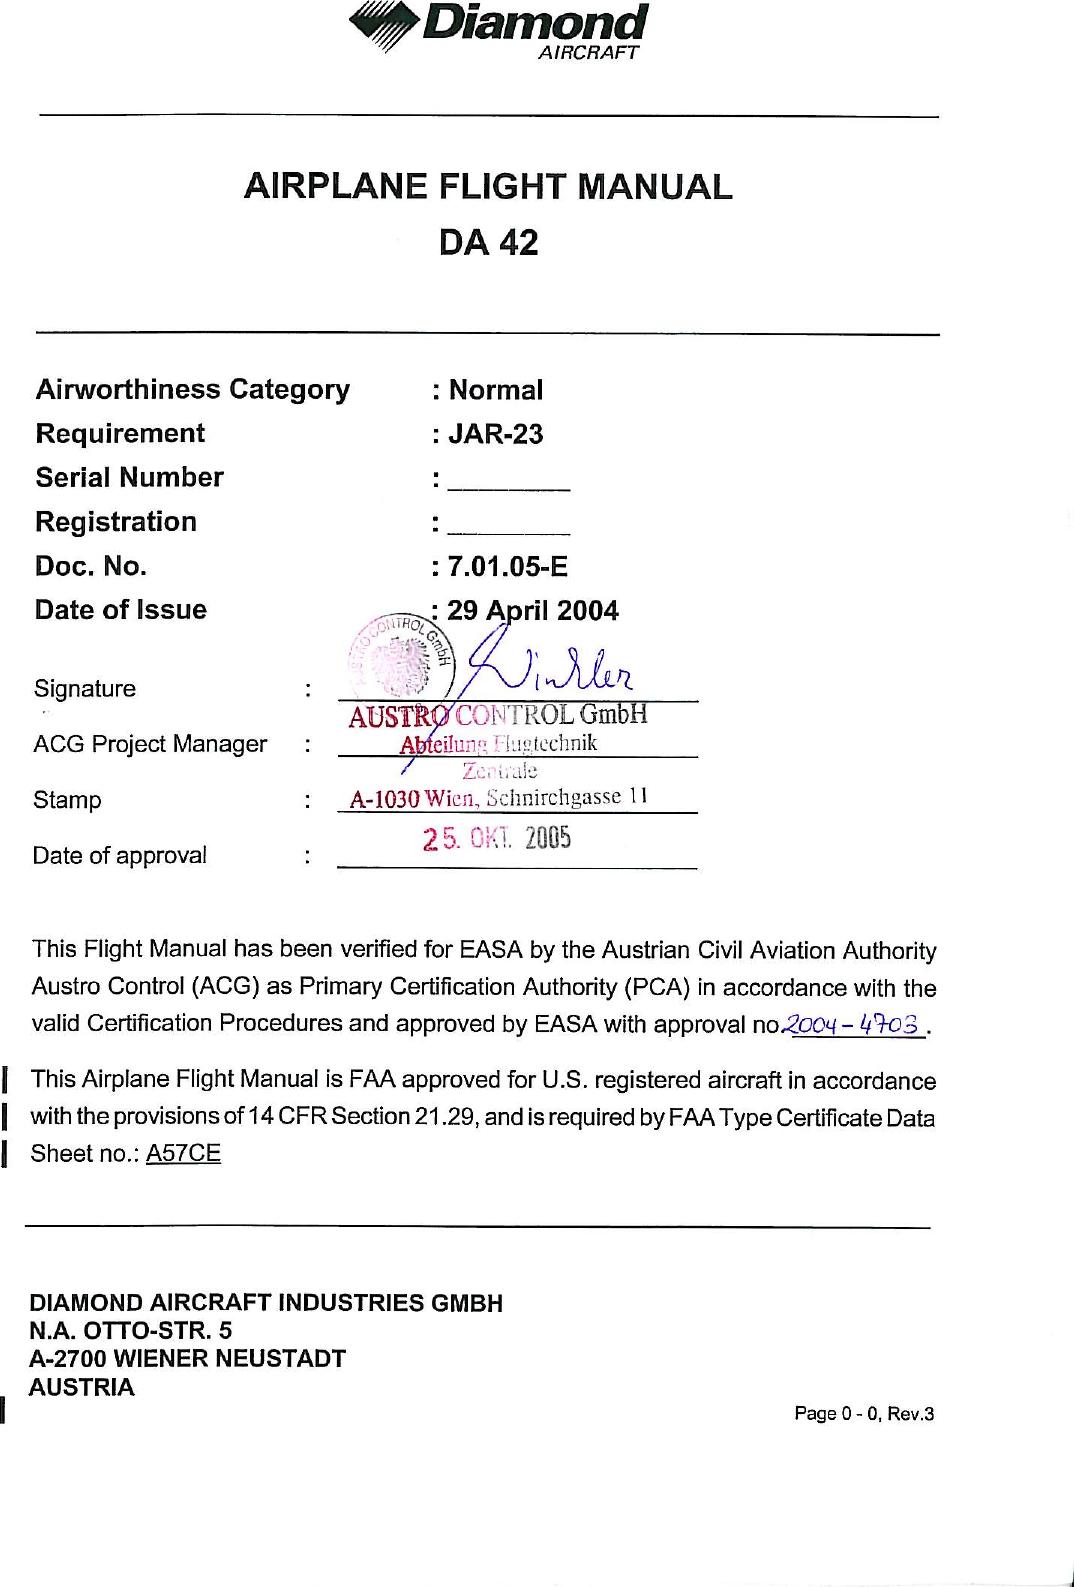 Da 42 Afm Rev 4 Da42 Diamond Twin Flight Manual 24 Volt 8030 Alternator Wiring Diagram